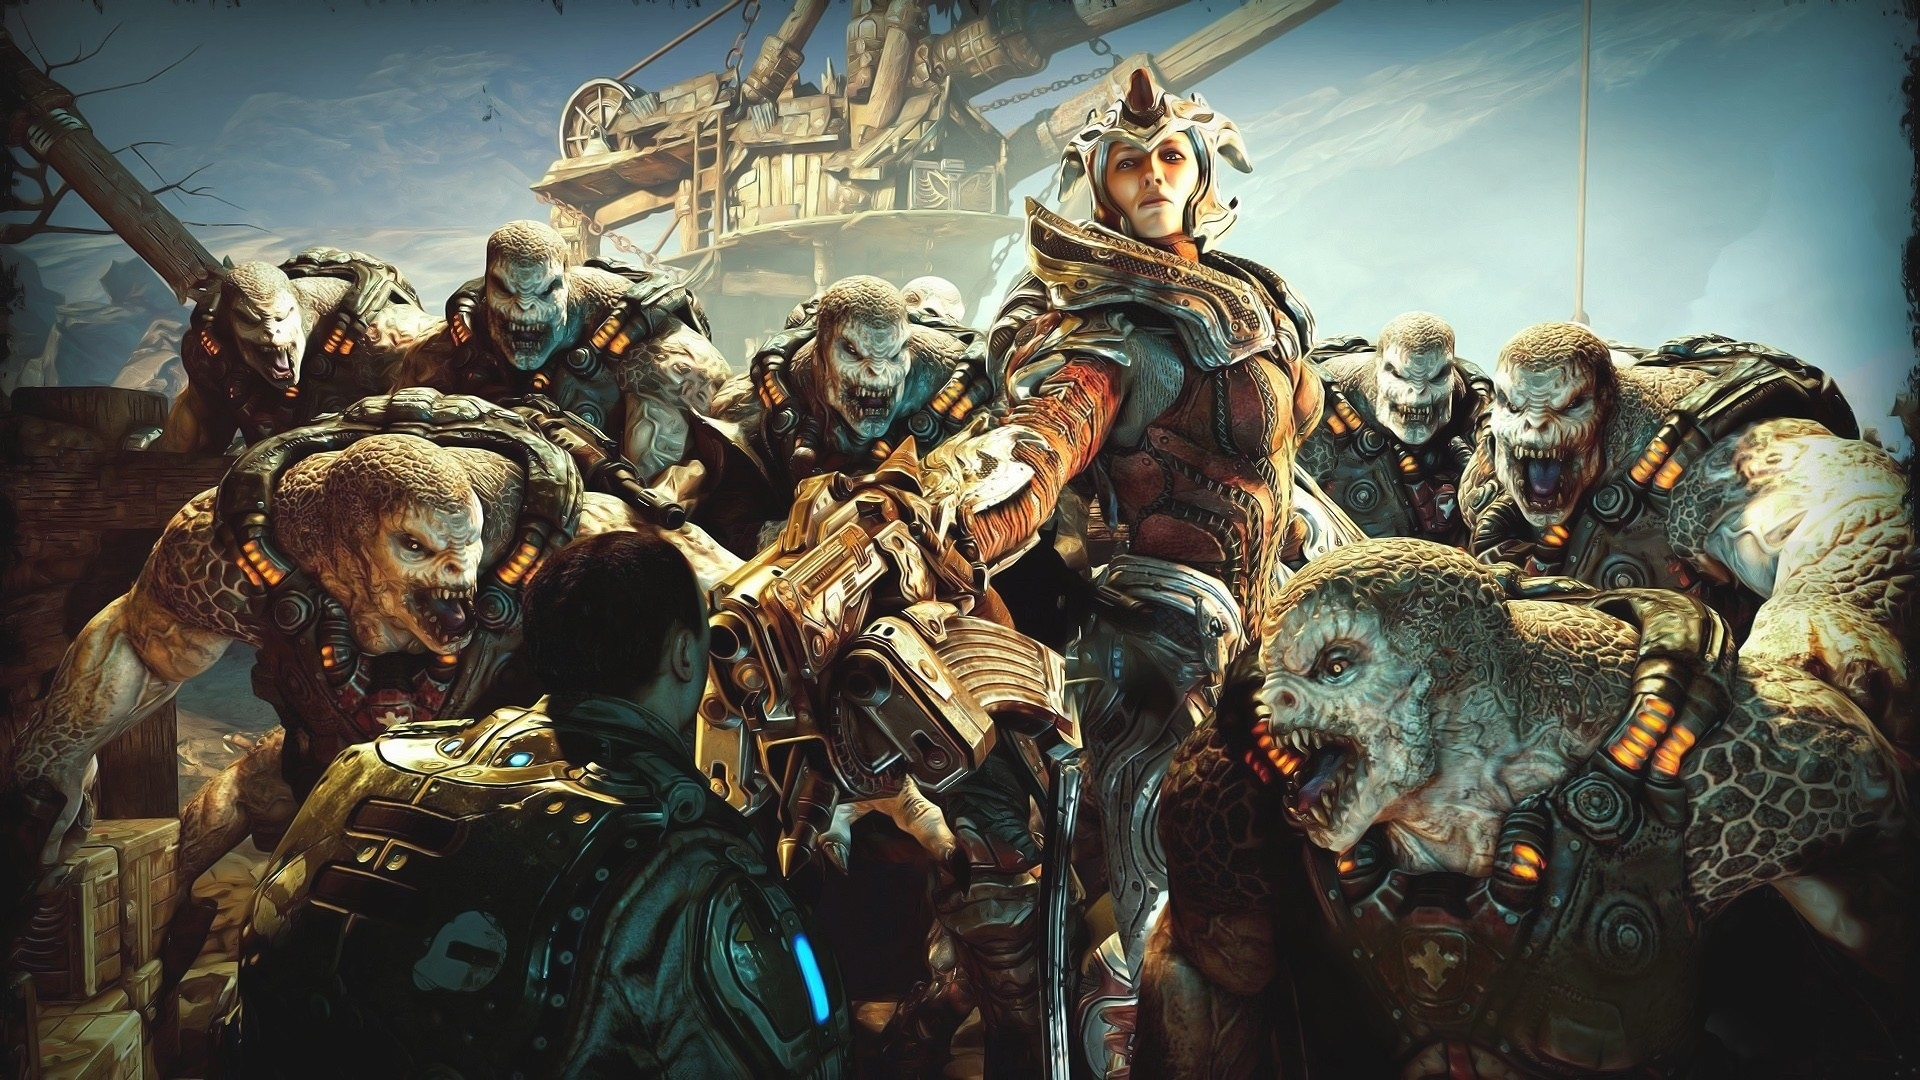 Gears Of War desktop background